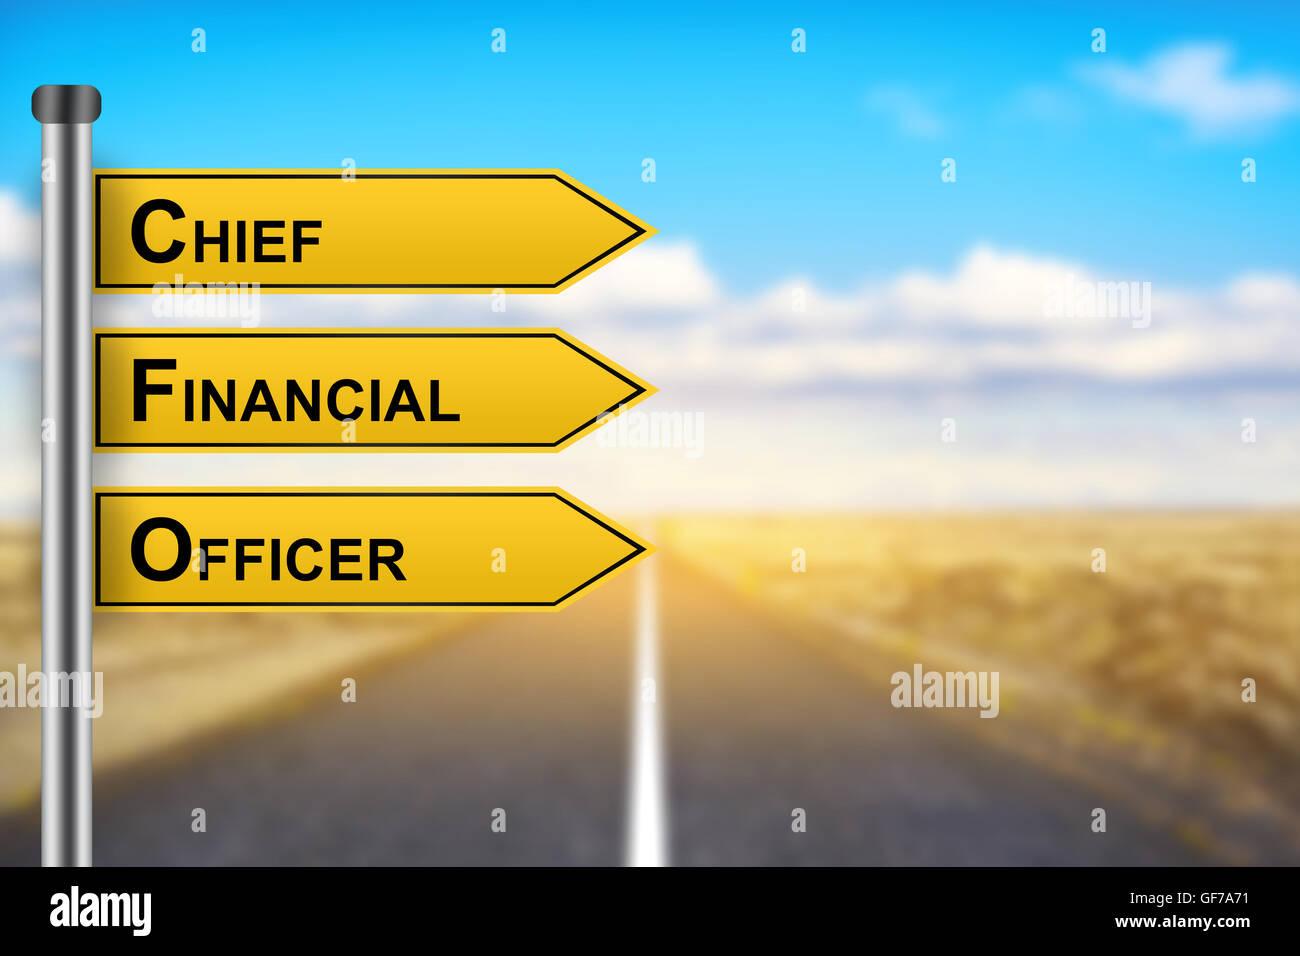 Cfo stock photos cfo stock images alamy - Chief financial officer cfo ...